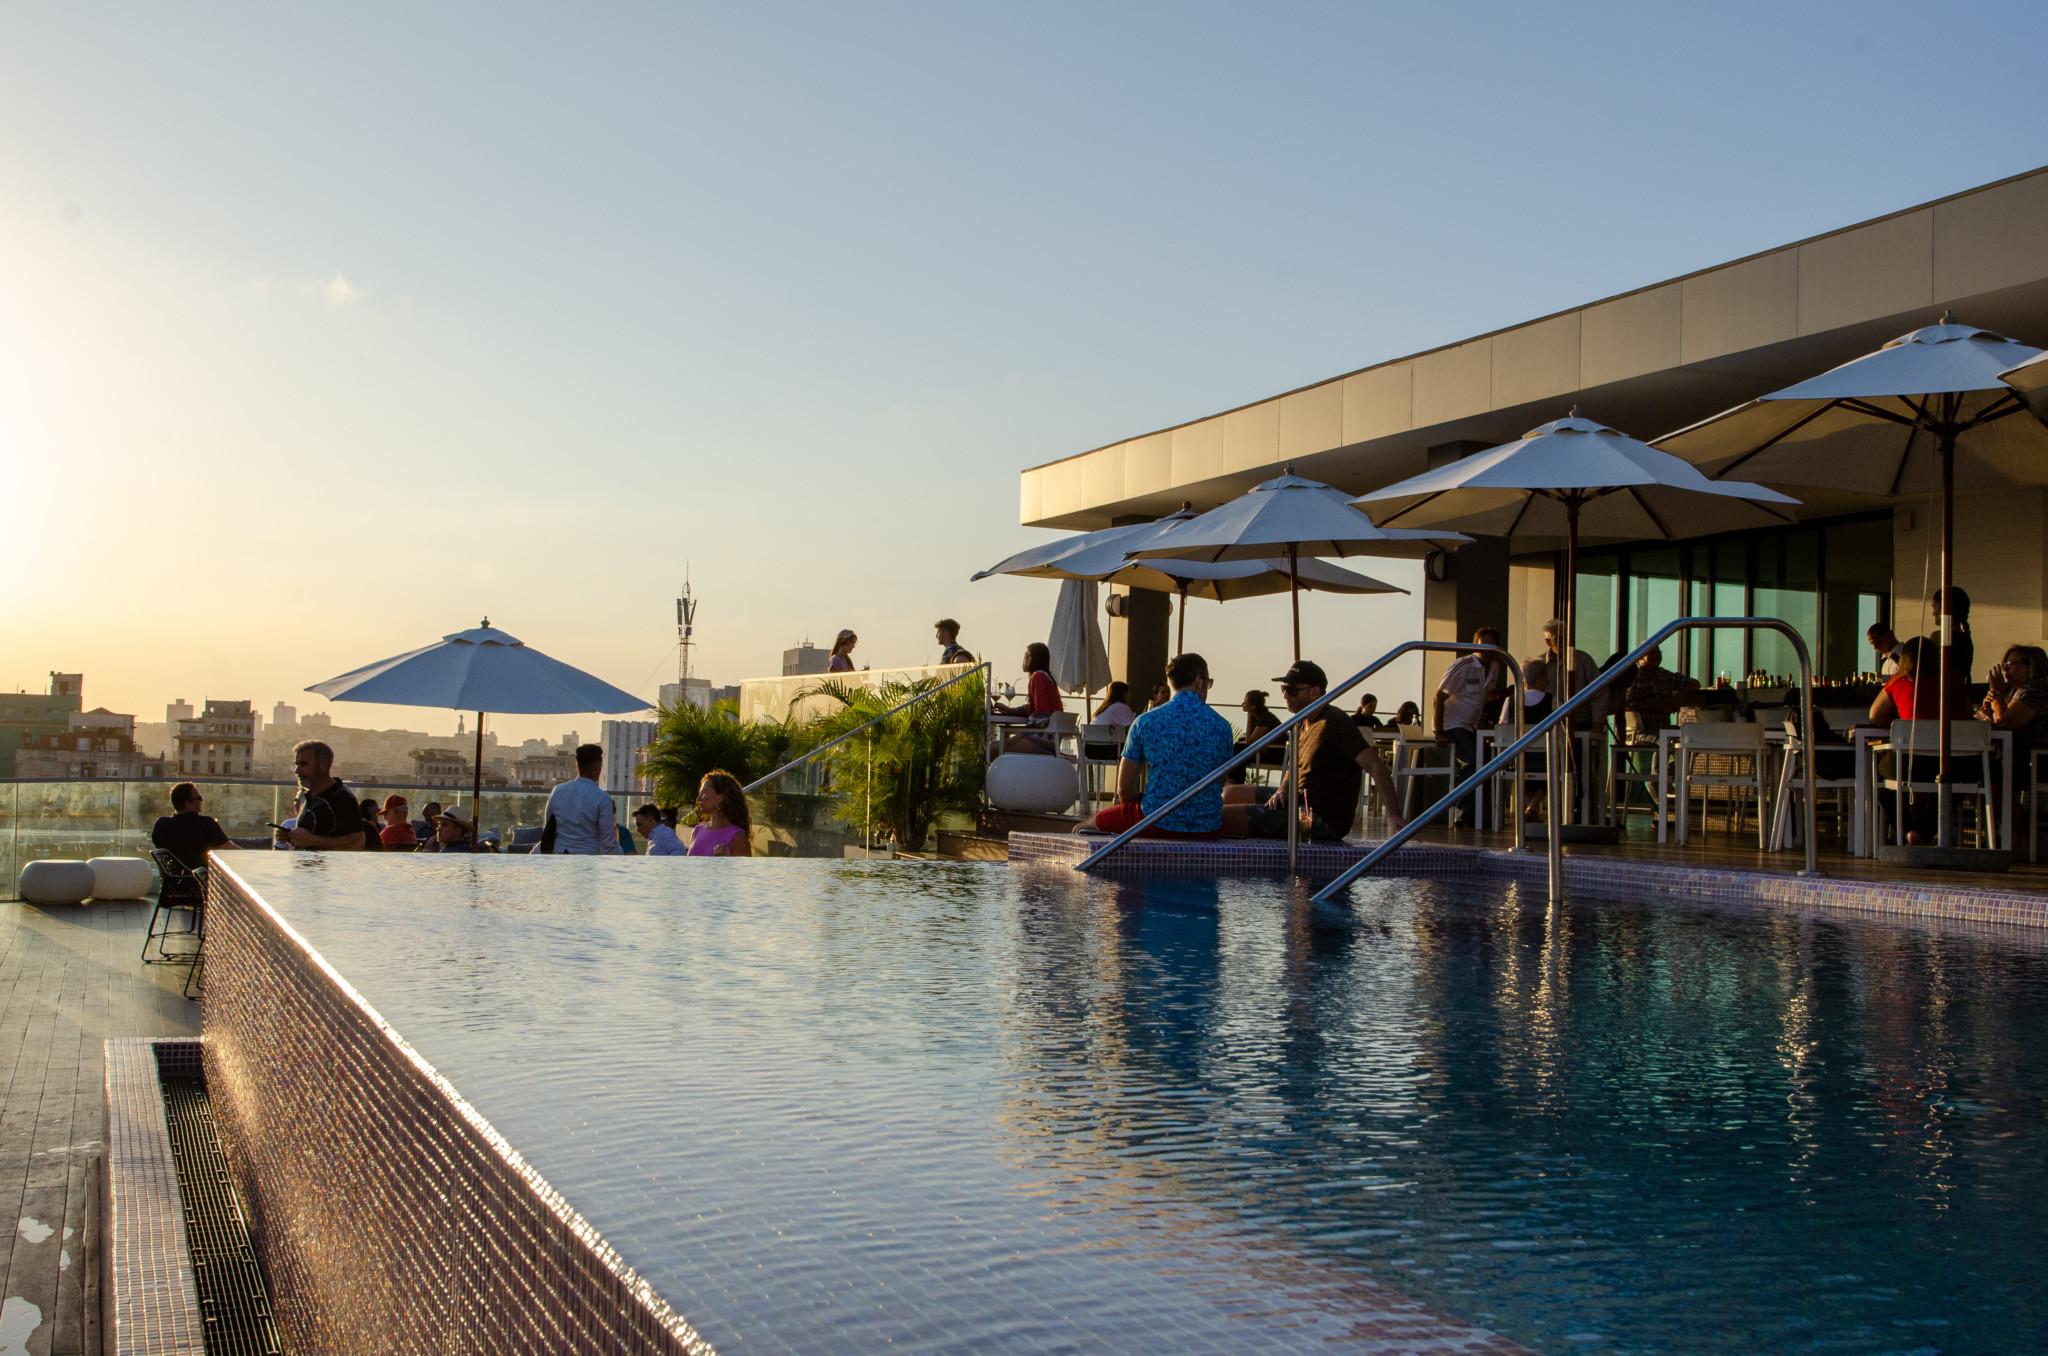 Kuba Hotel-Tipps: Wo kann man in Kuba übernachten?